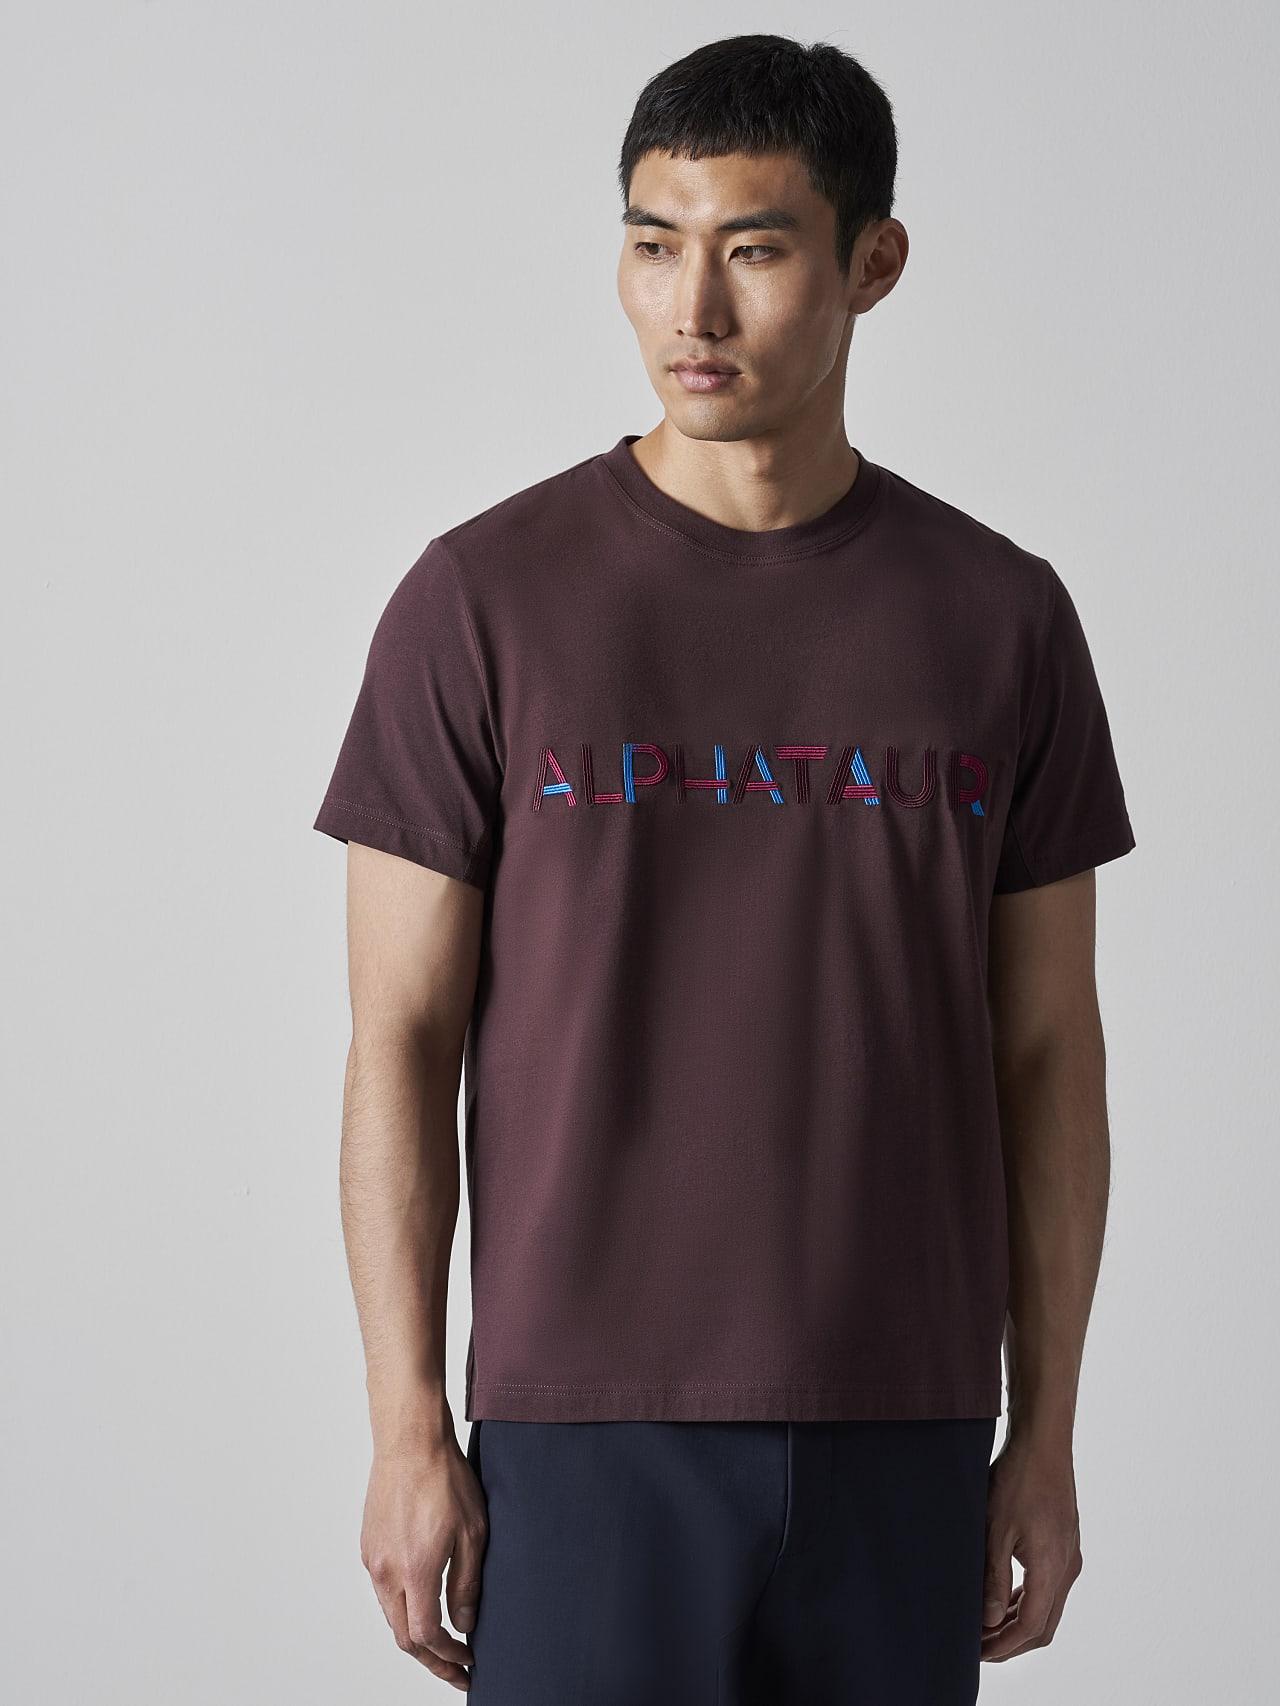 JANOS V3.Y5.02 Logo Embroidery T-Shirt Burgundy Right Alpha Tauri